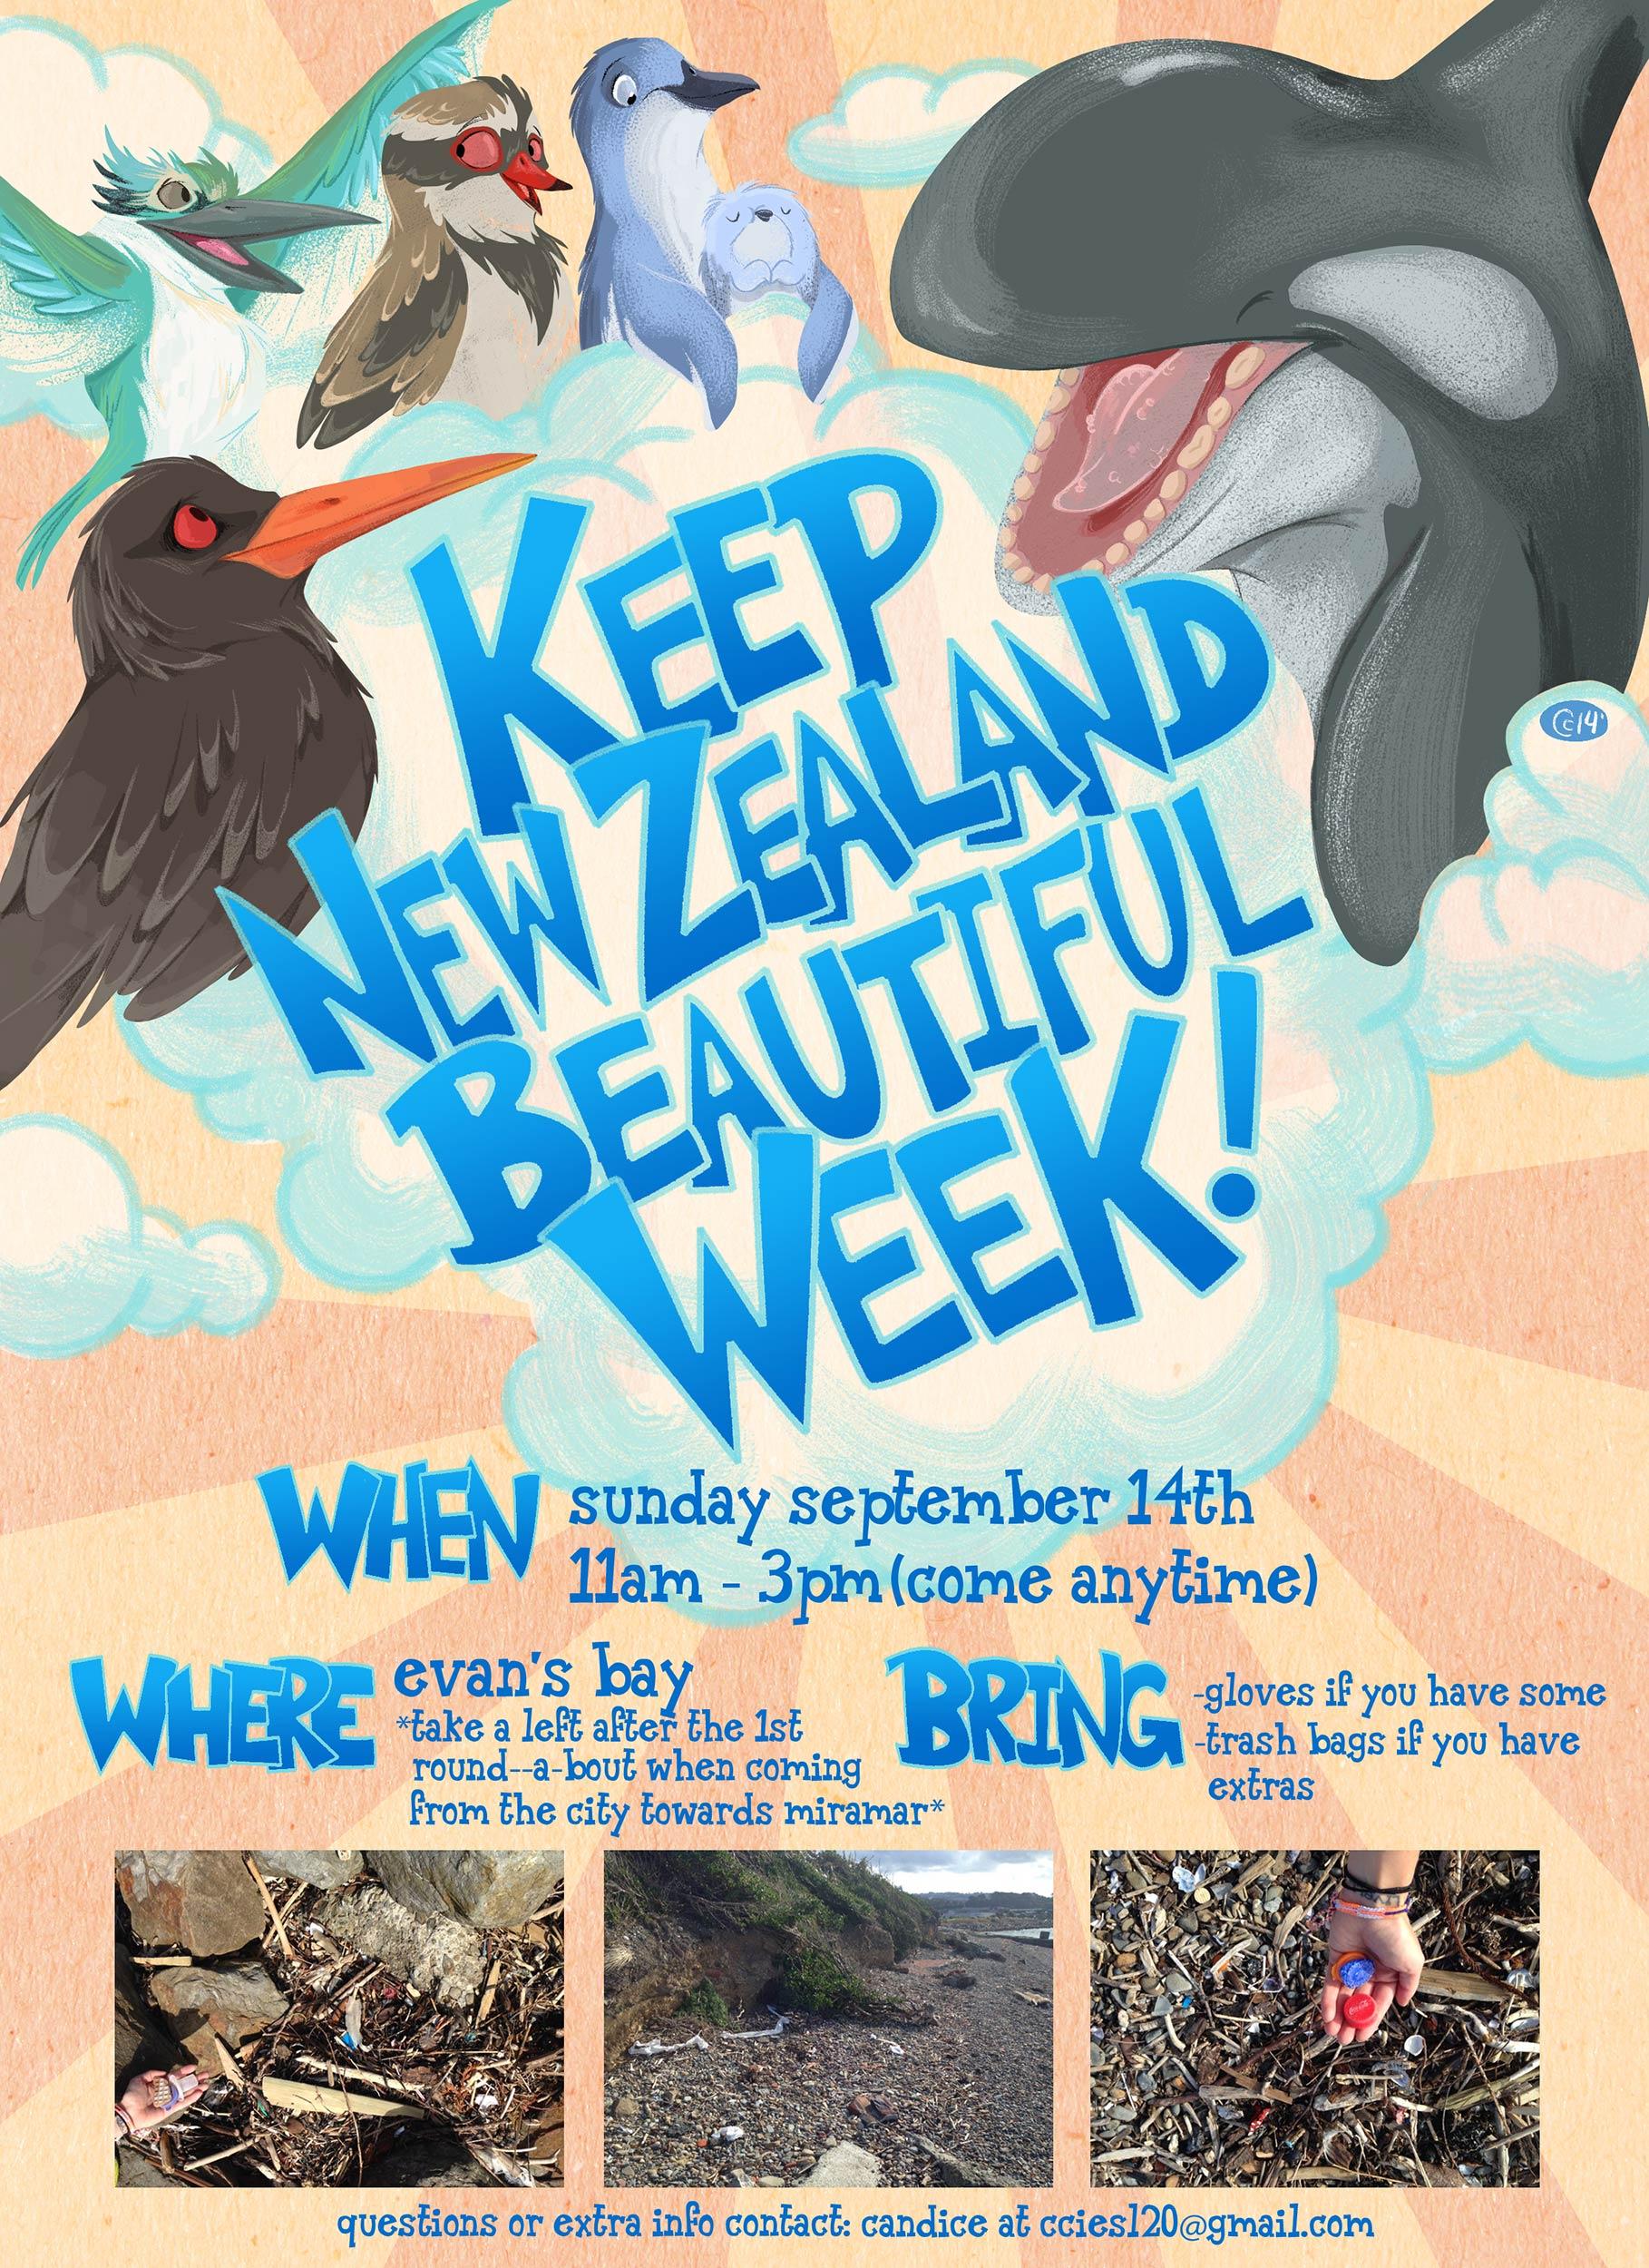 keep_nz_beautiful_week_poster.jpg